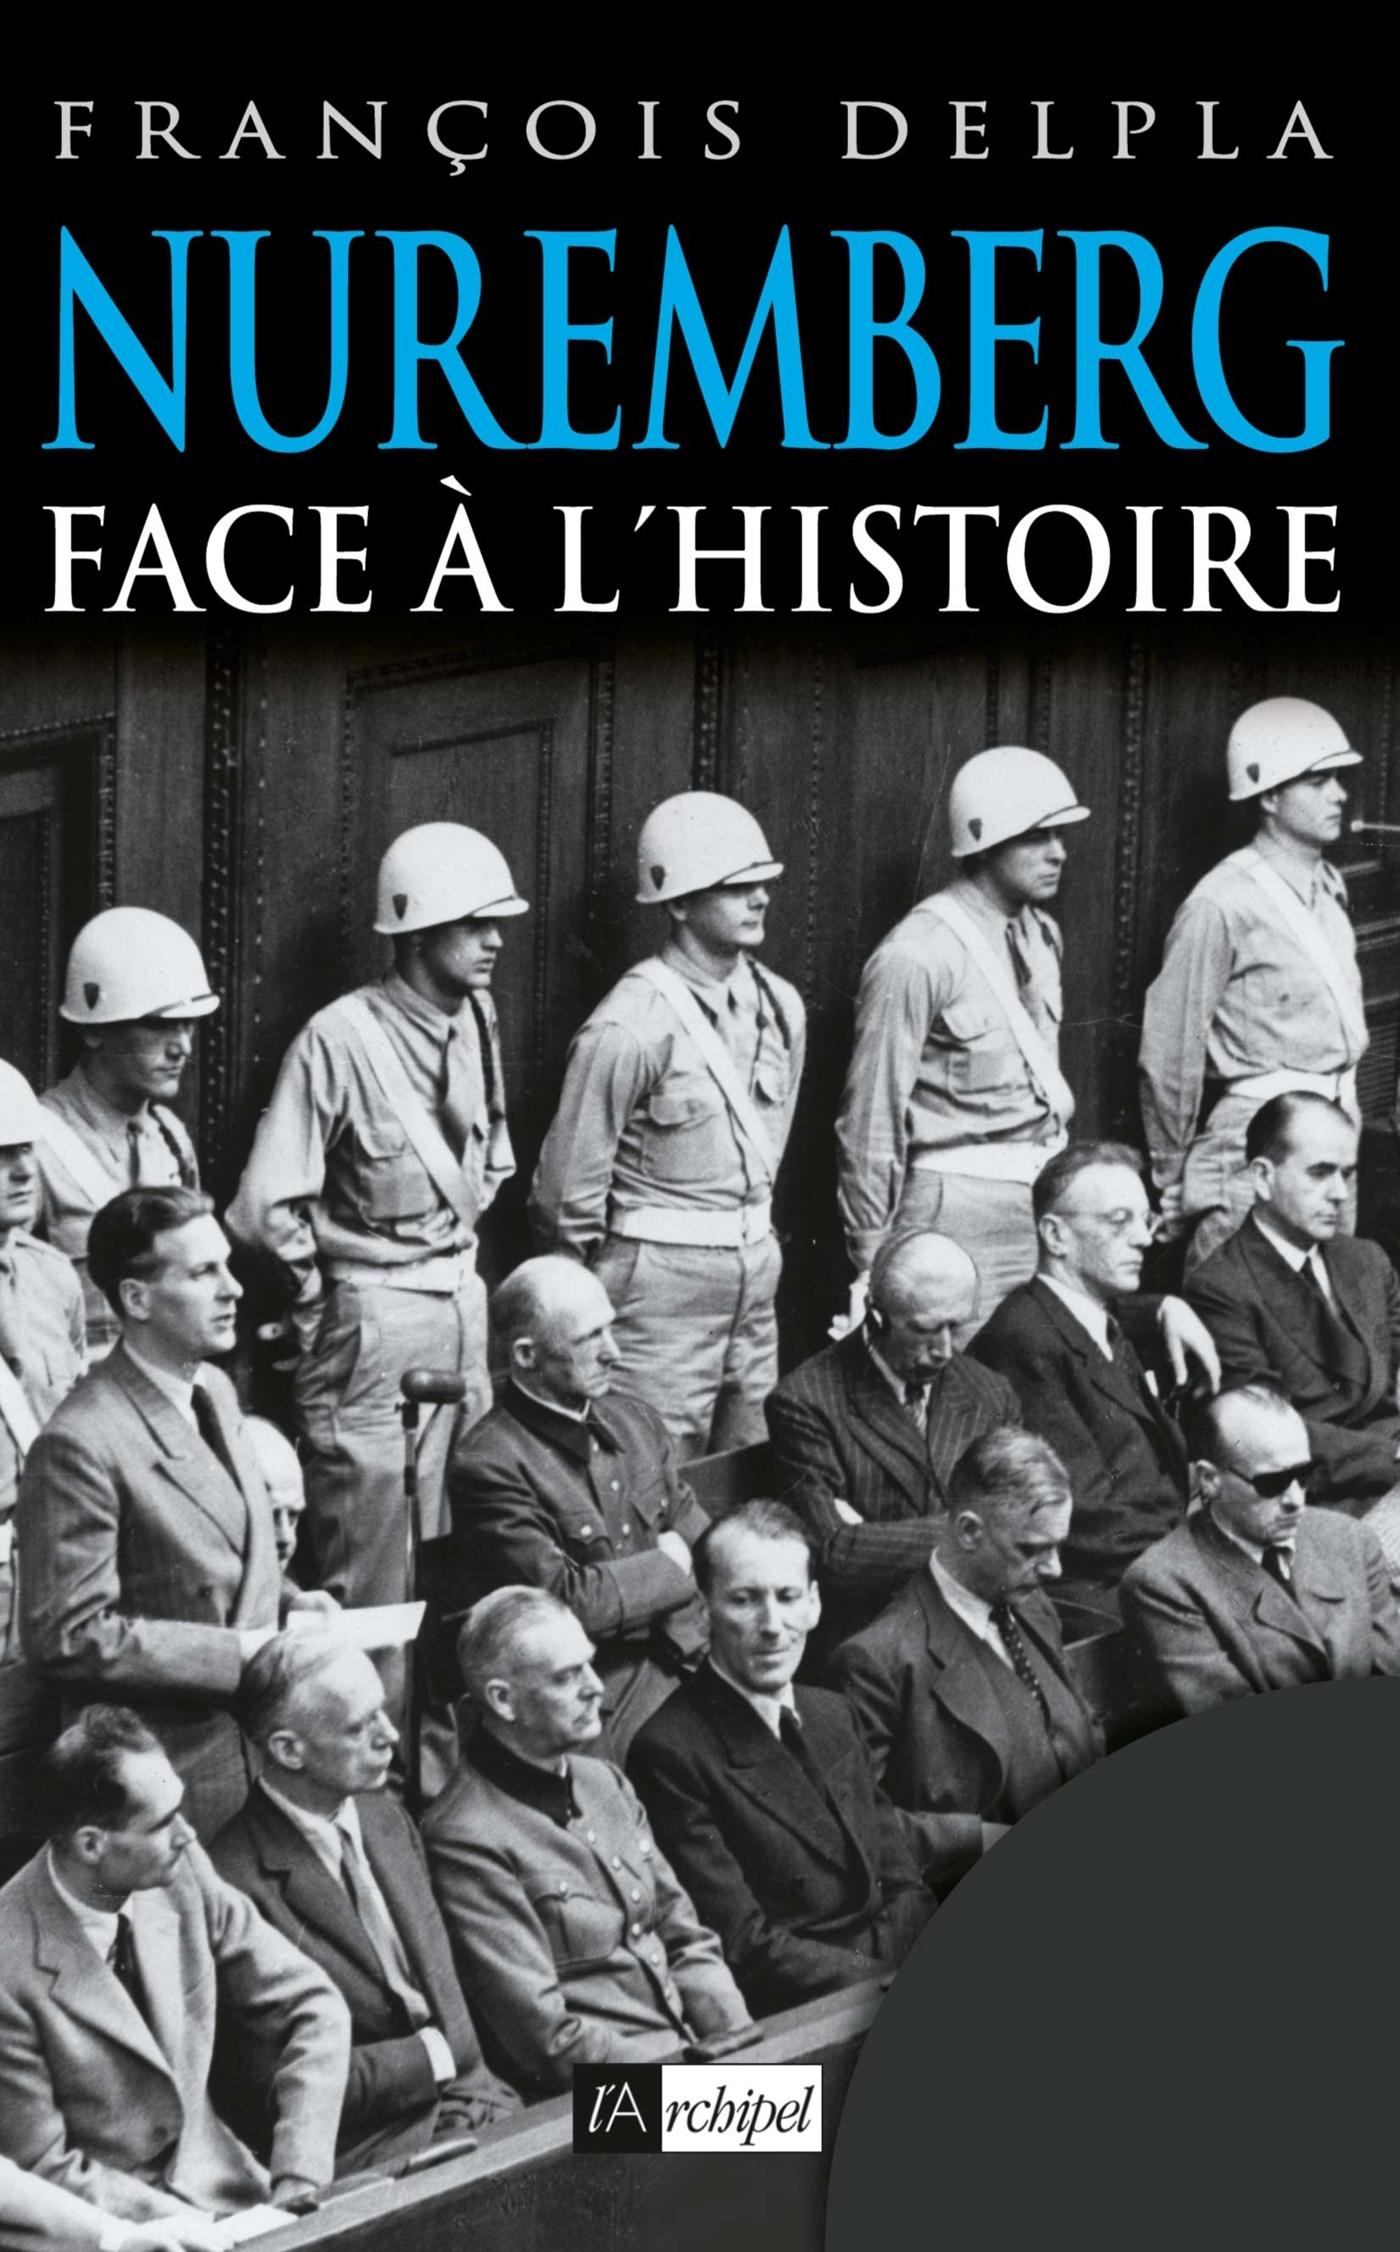 NUREMBERG FACE A L'HISTOIRE